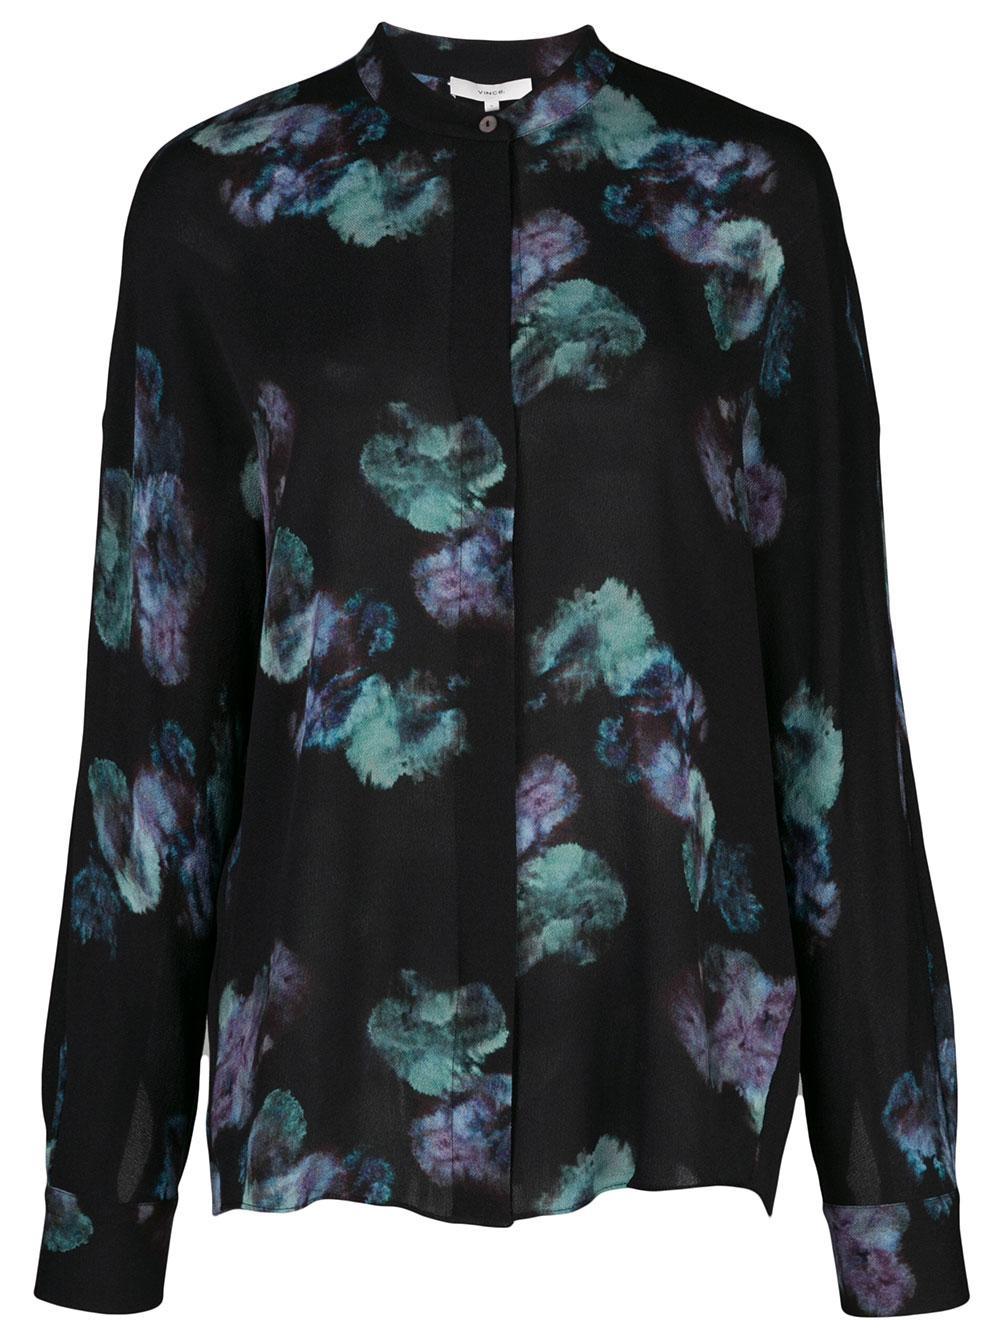 Painted Floral Blouse Item # V630712268